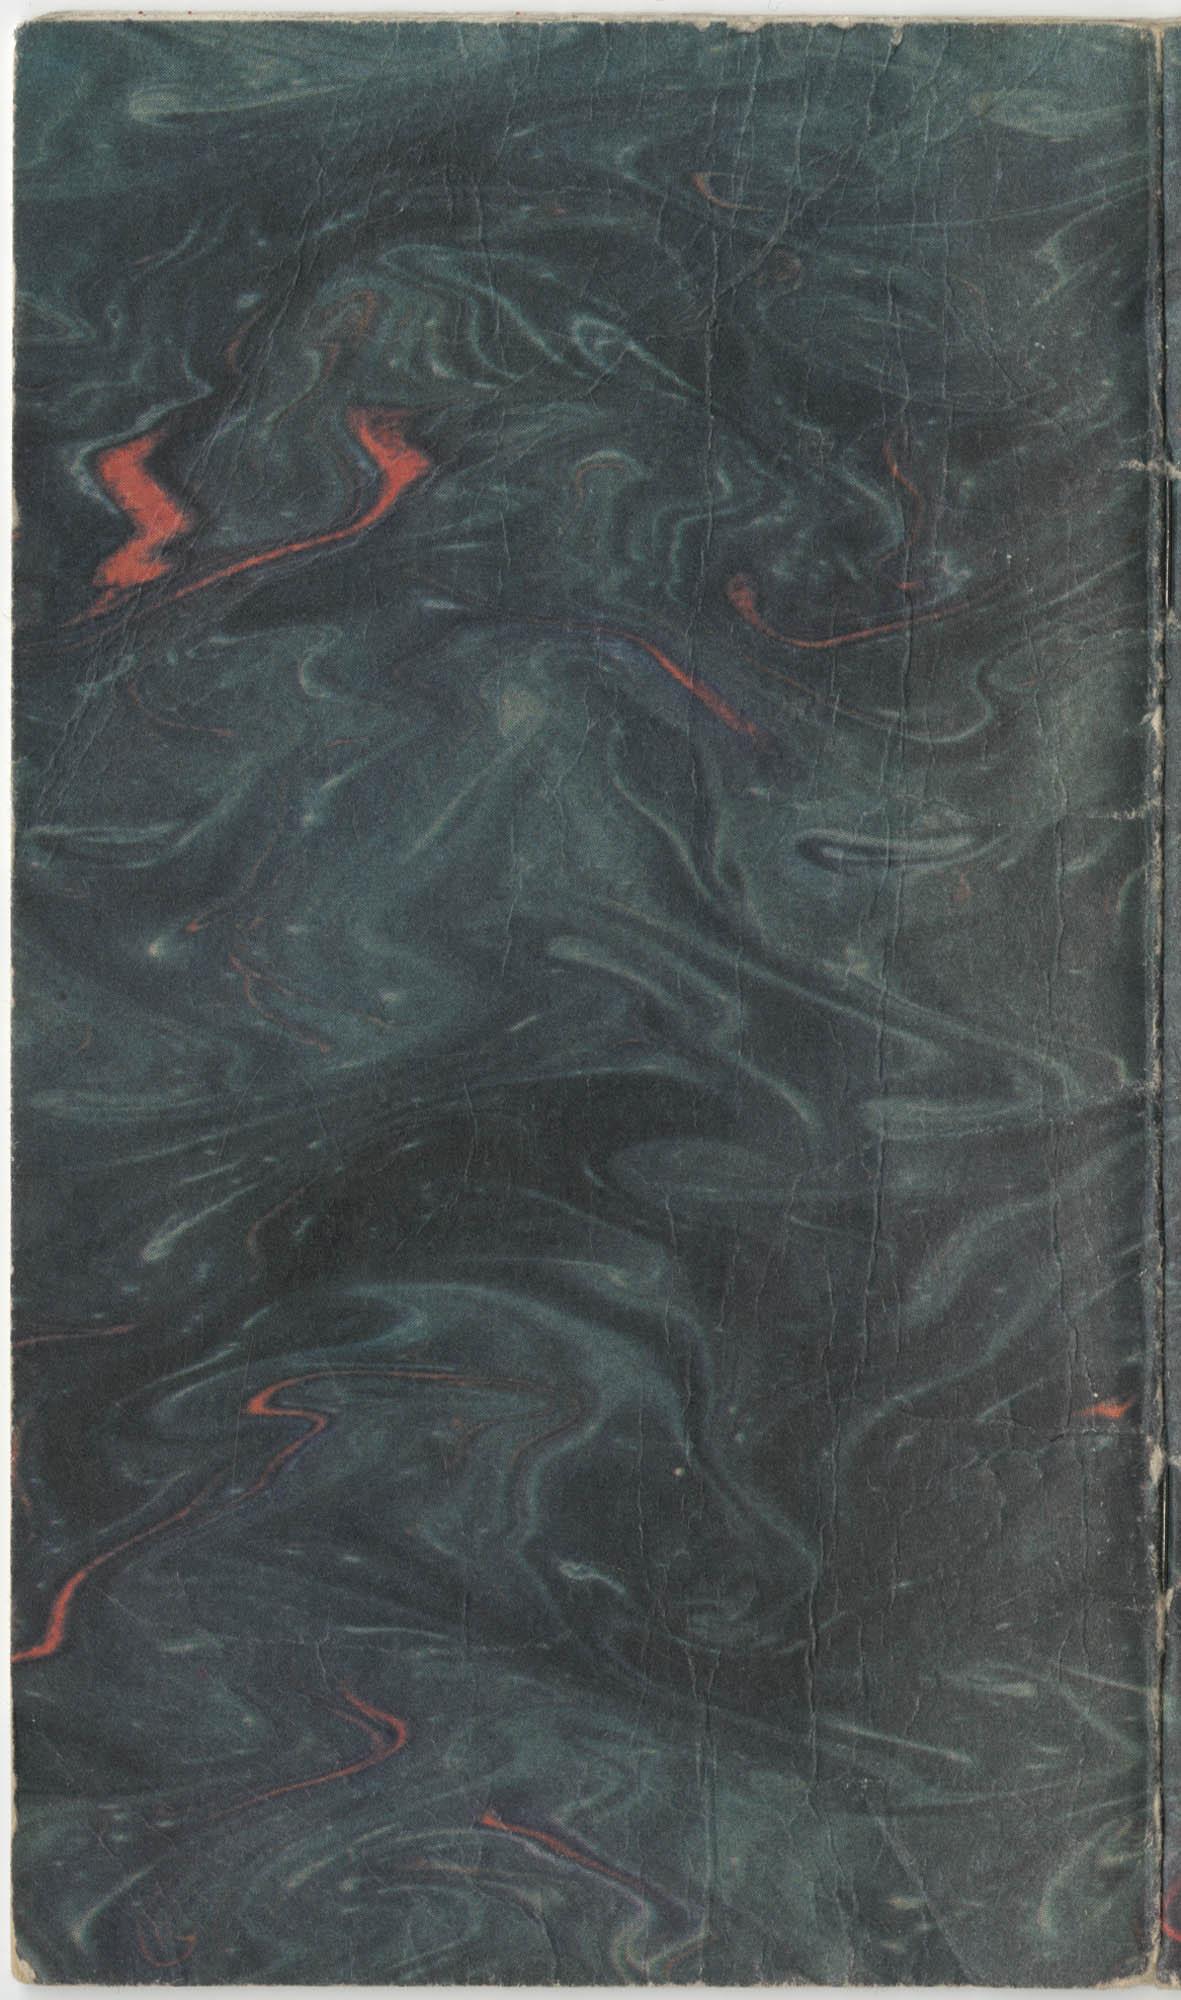 Bernice Robinson's 1973 Pocket Secretary, Back Cover